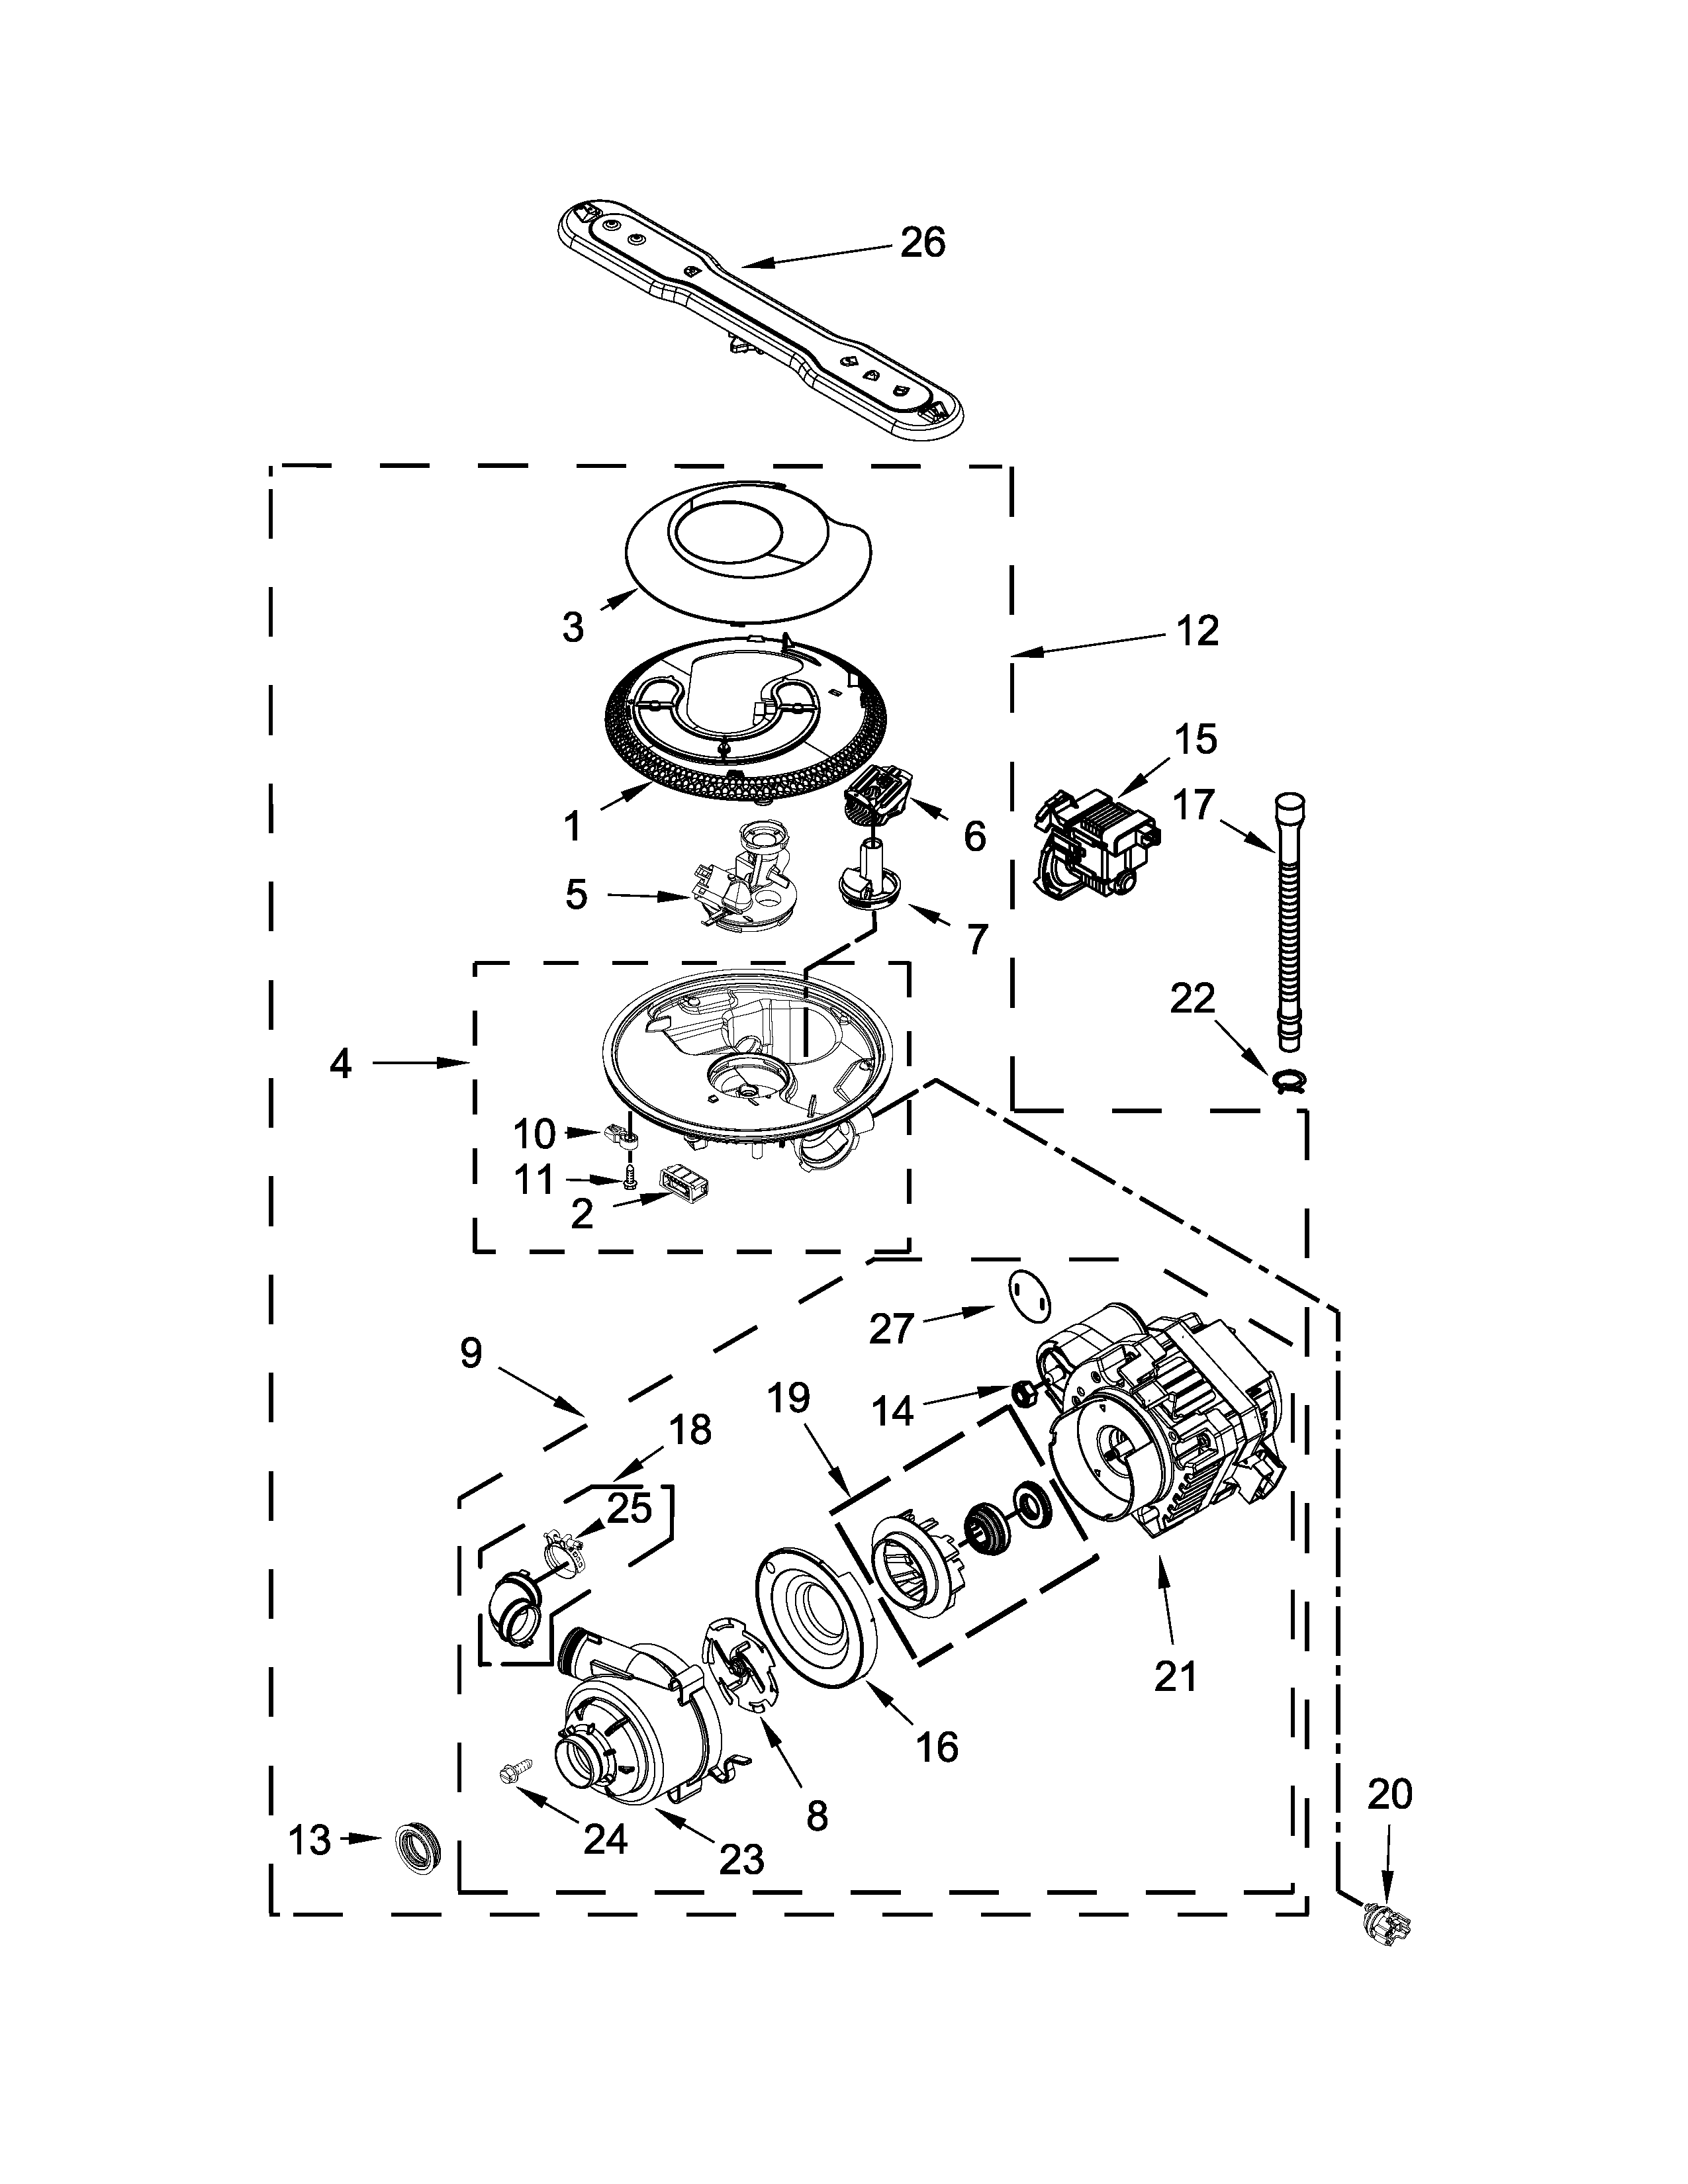 Image result for diagrams for maytag dishwasher